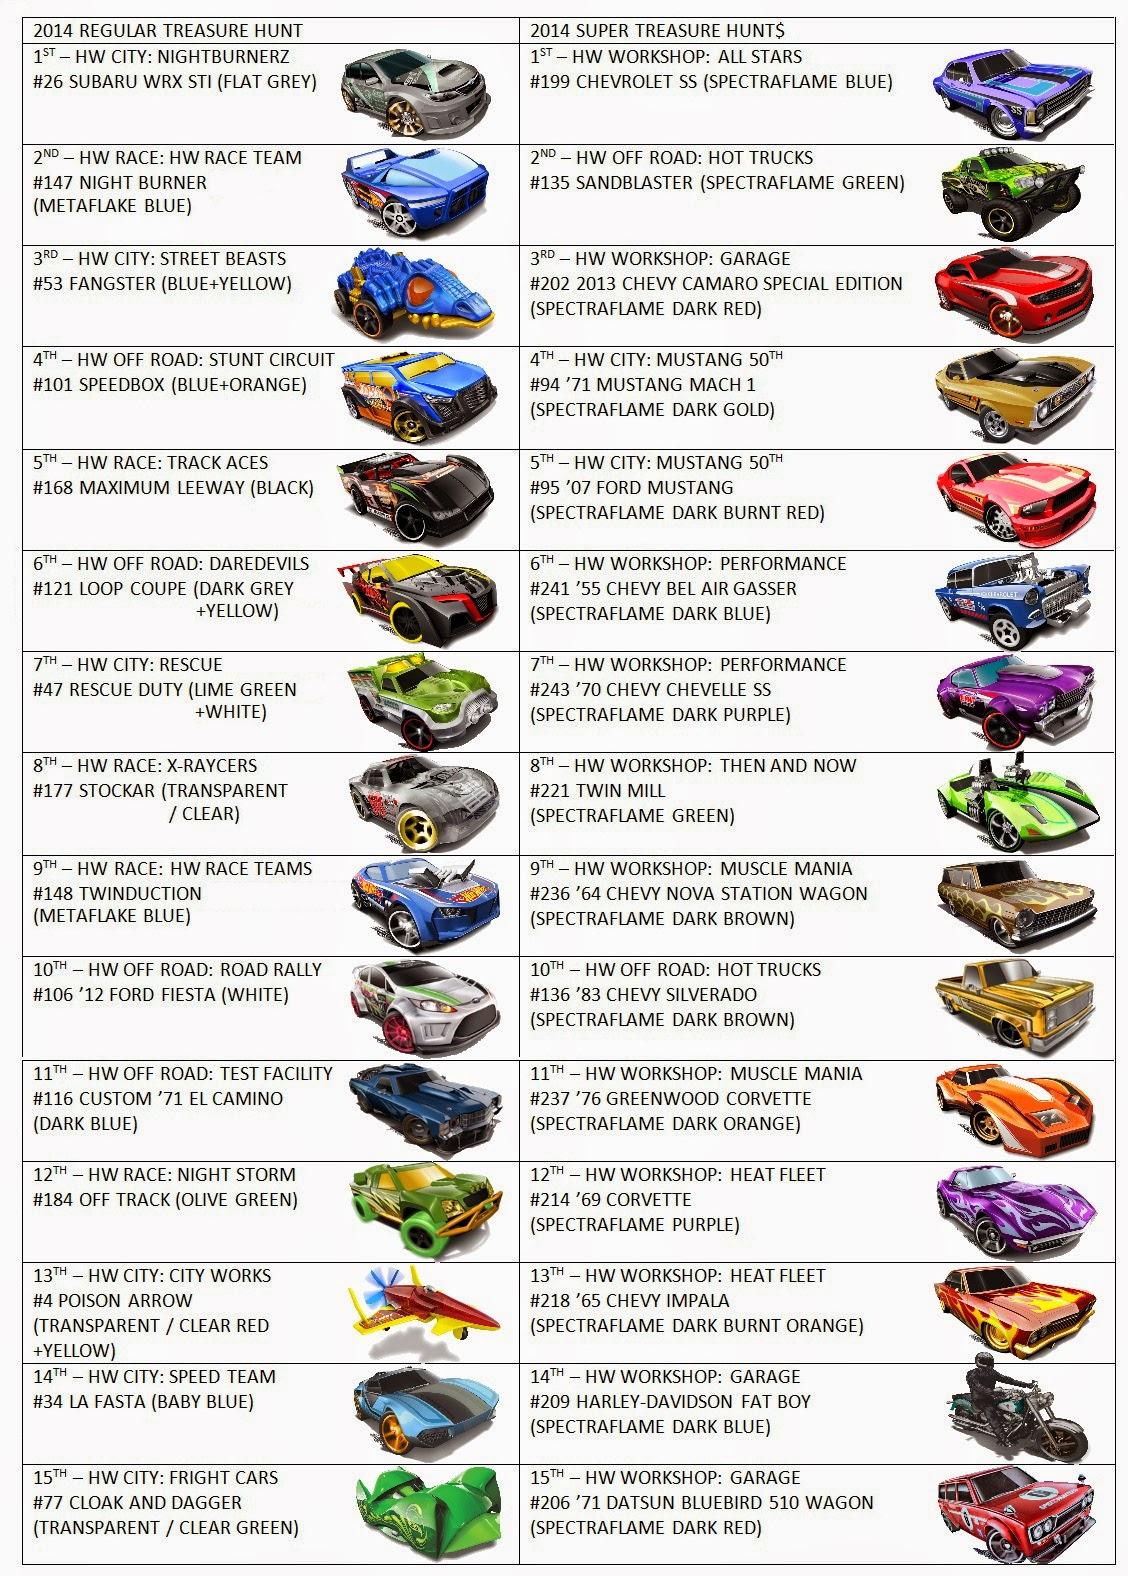 Kelvinator21's Hot Wheels